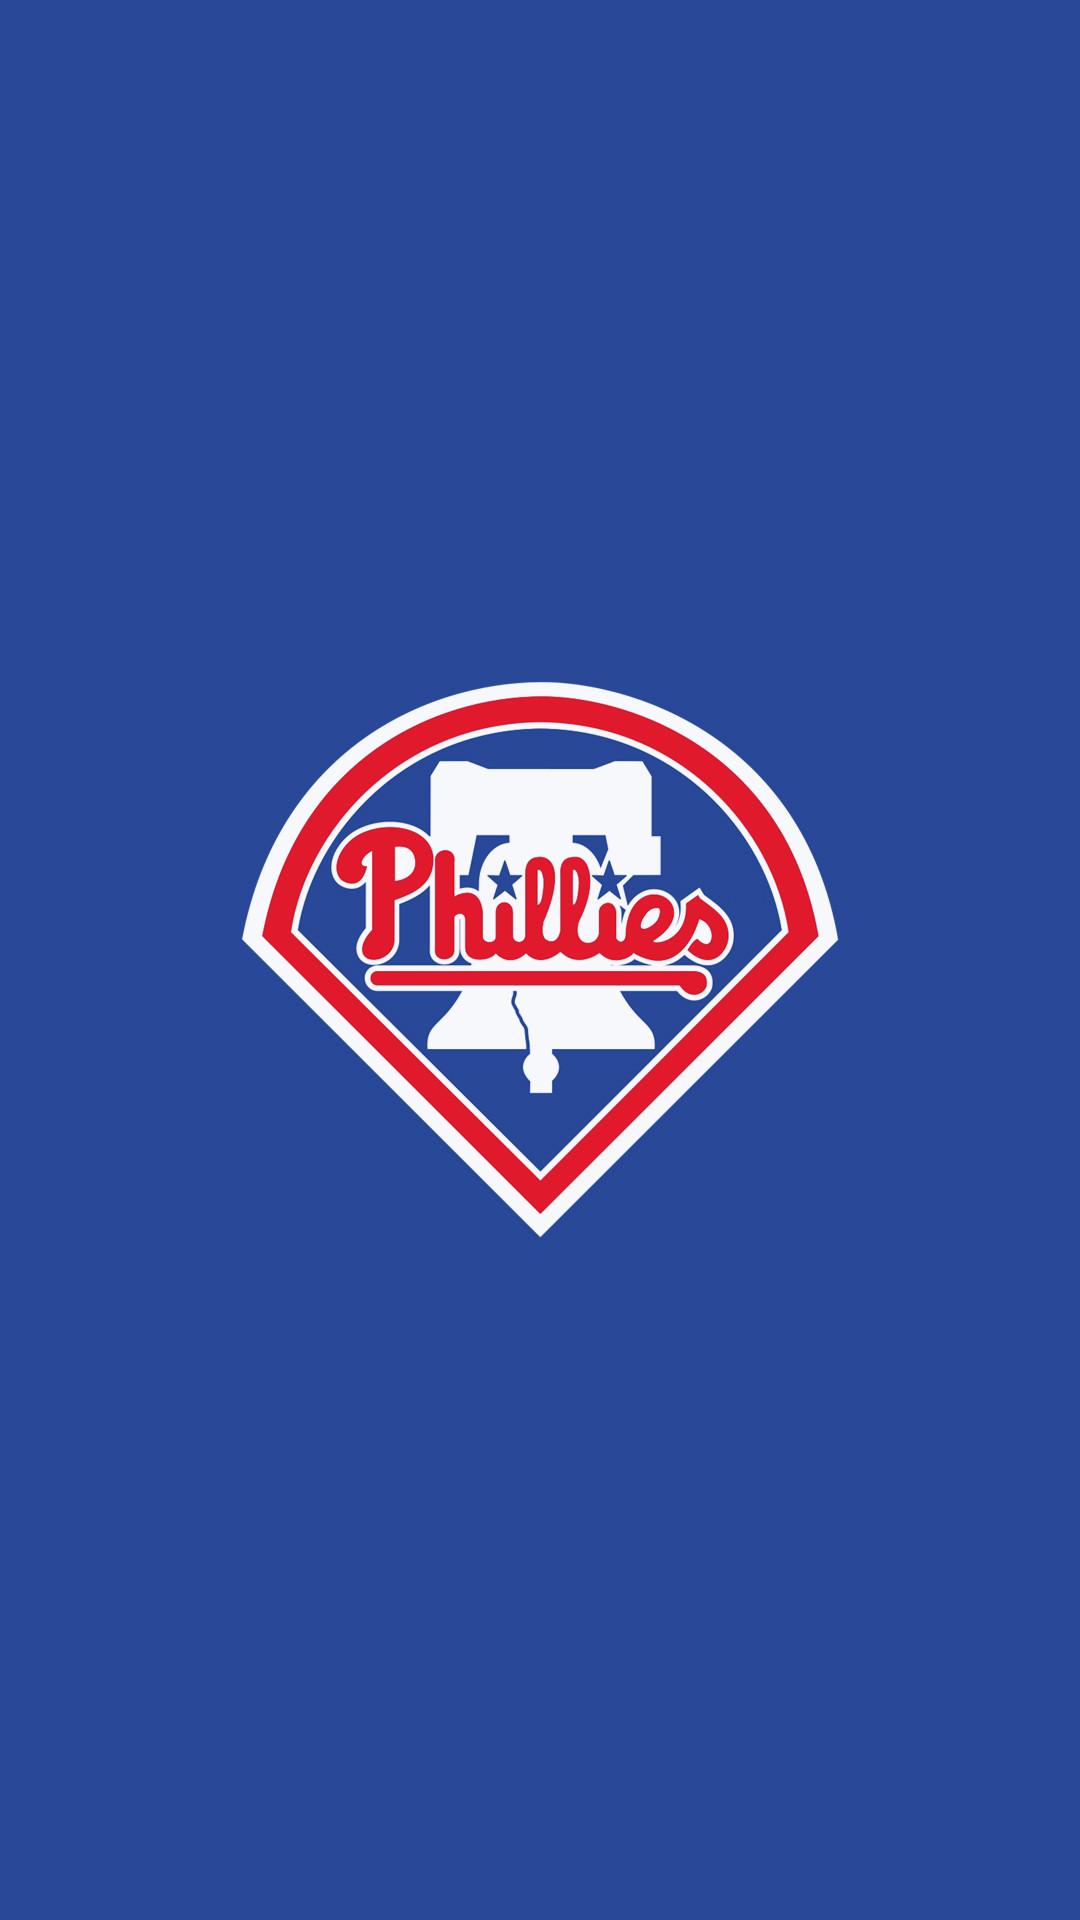 … Philadelphia Phillies Iphone 7 Plus Wallpaper pertaining to  Philadelphia Phillies Phone Wallpapers